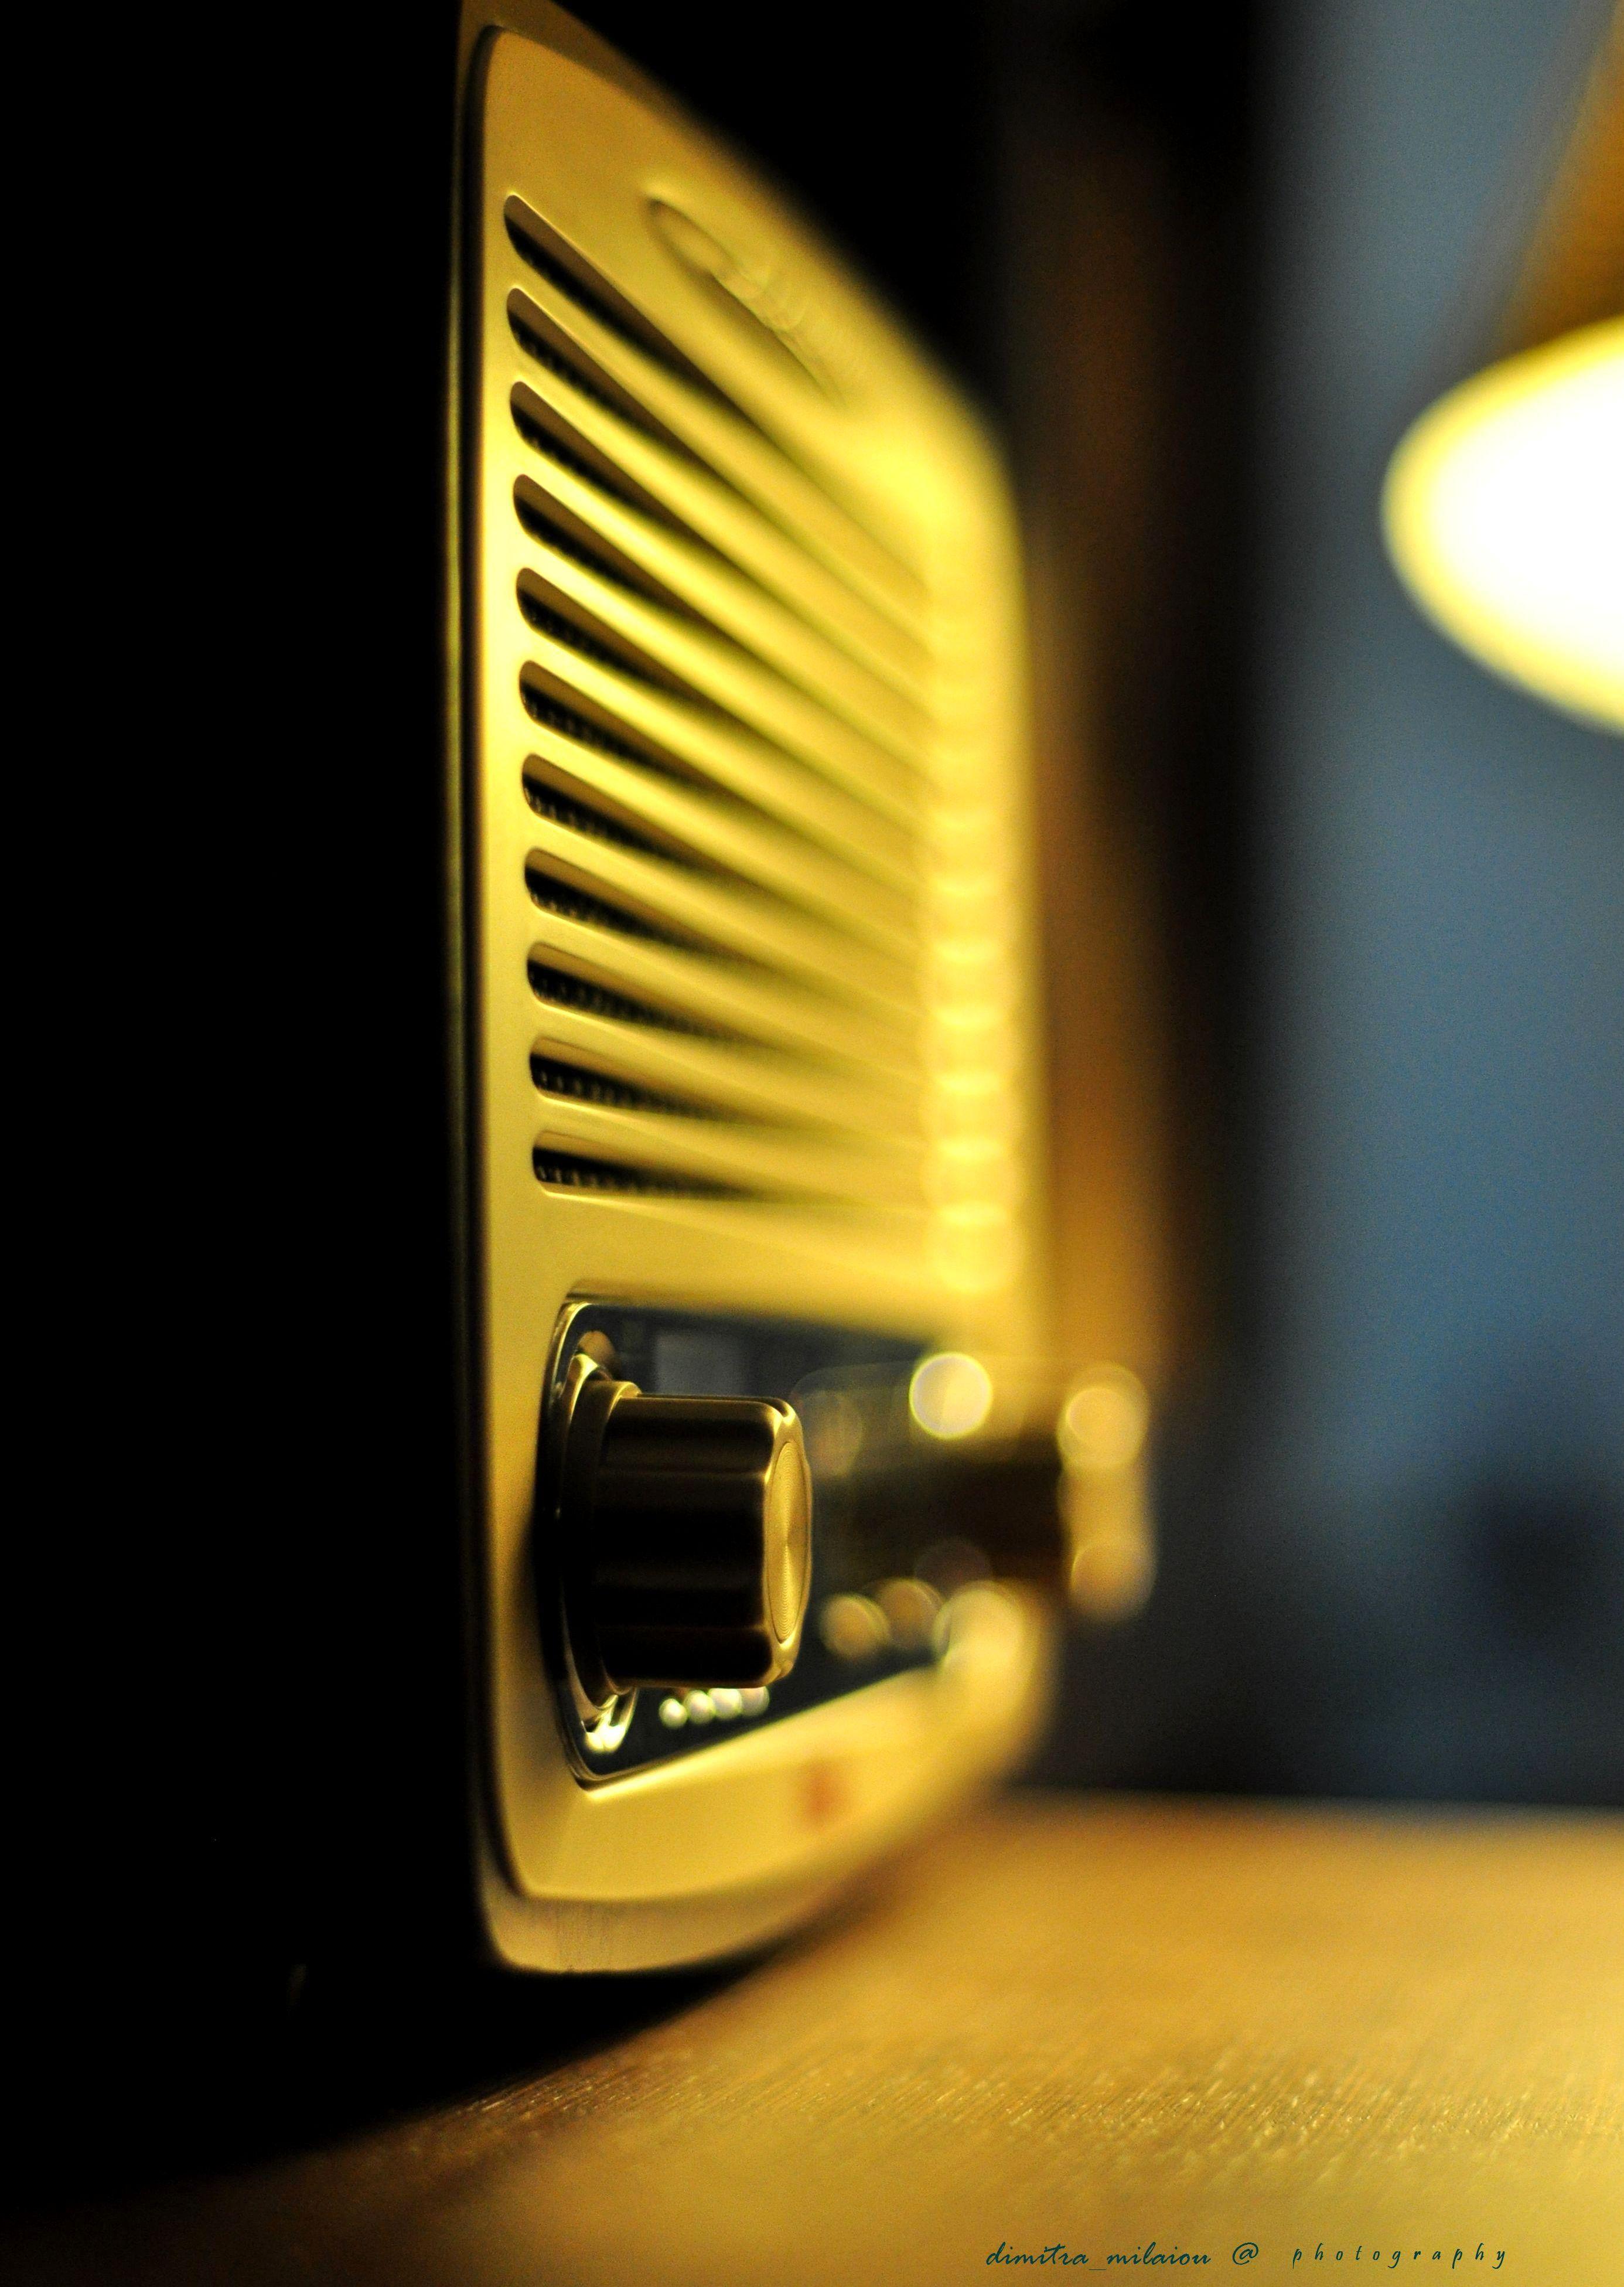 Wm Radio Stream